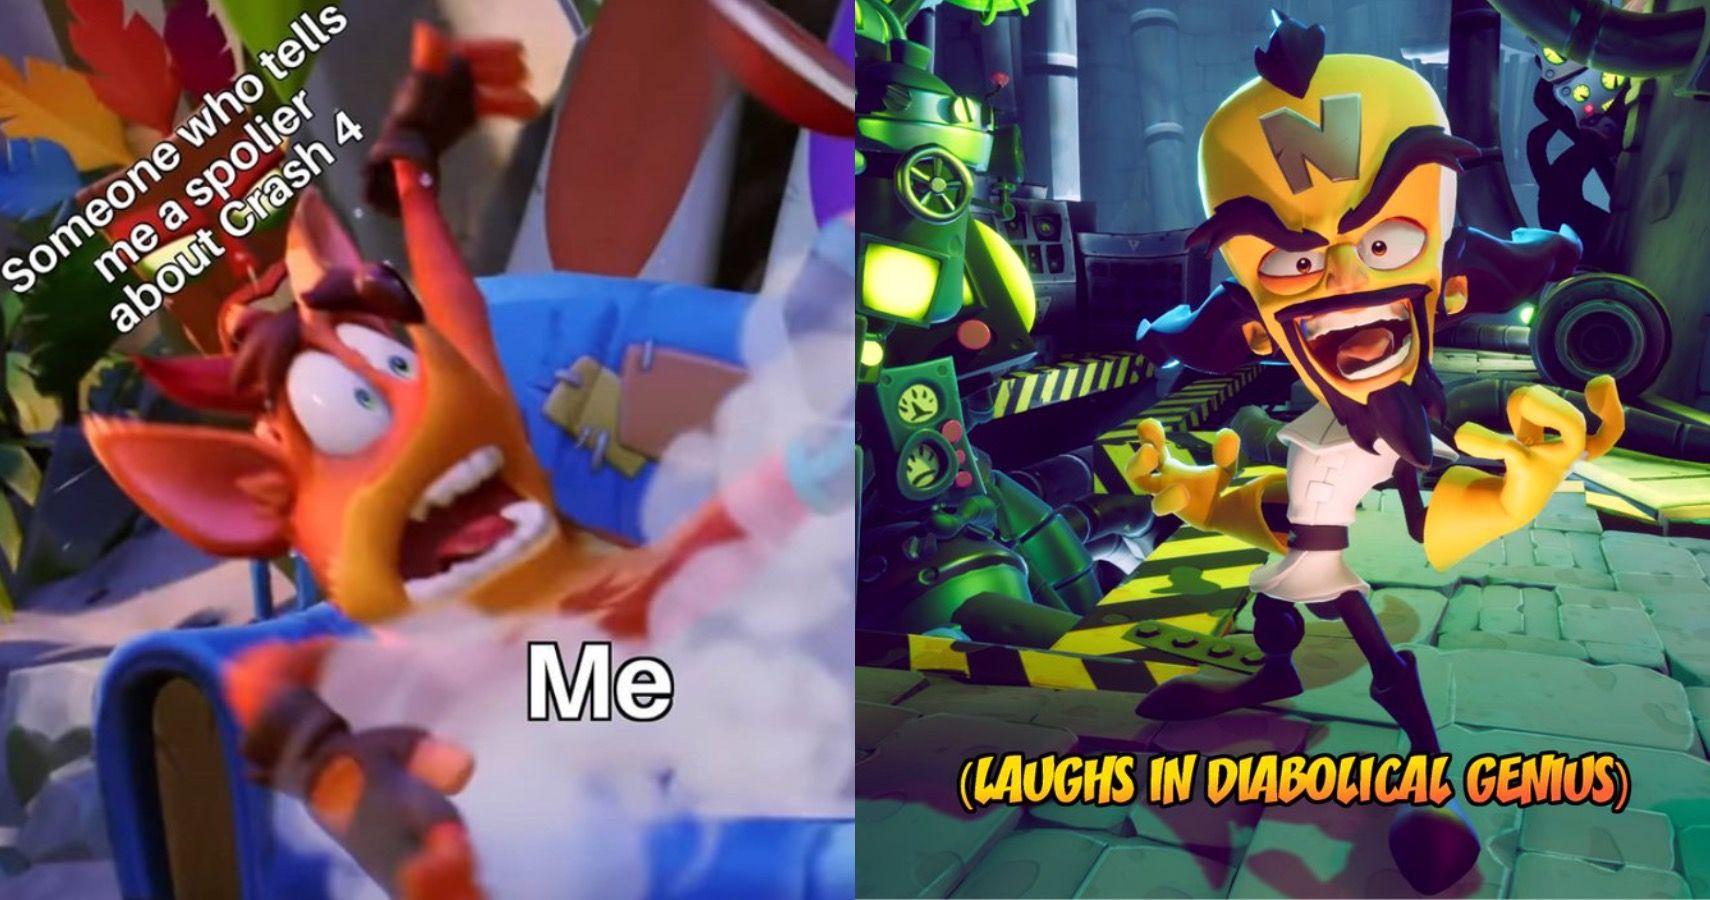 10 Funniest Crash Bandicoot 4 Memes | Game Rant